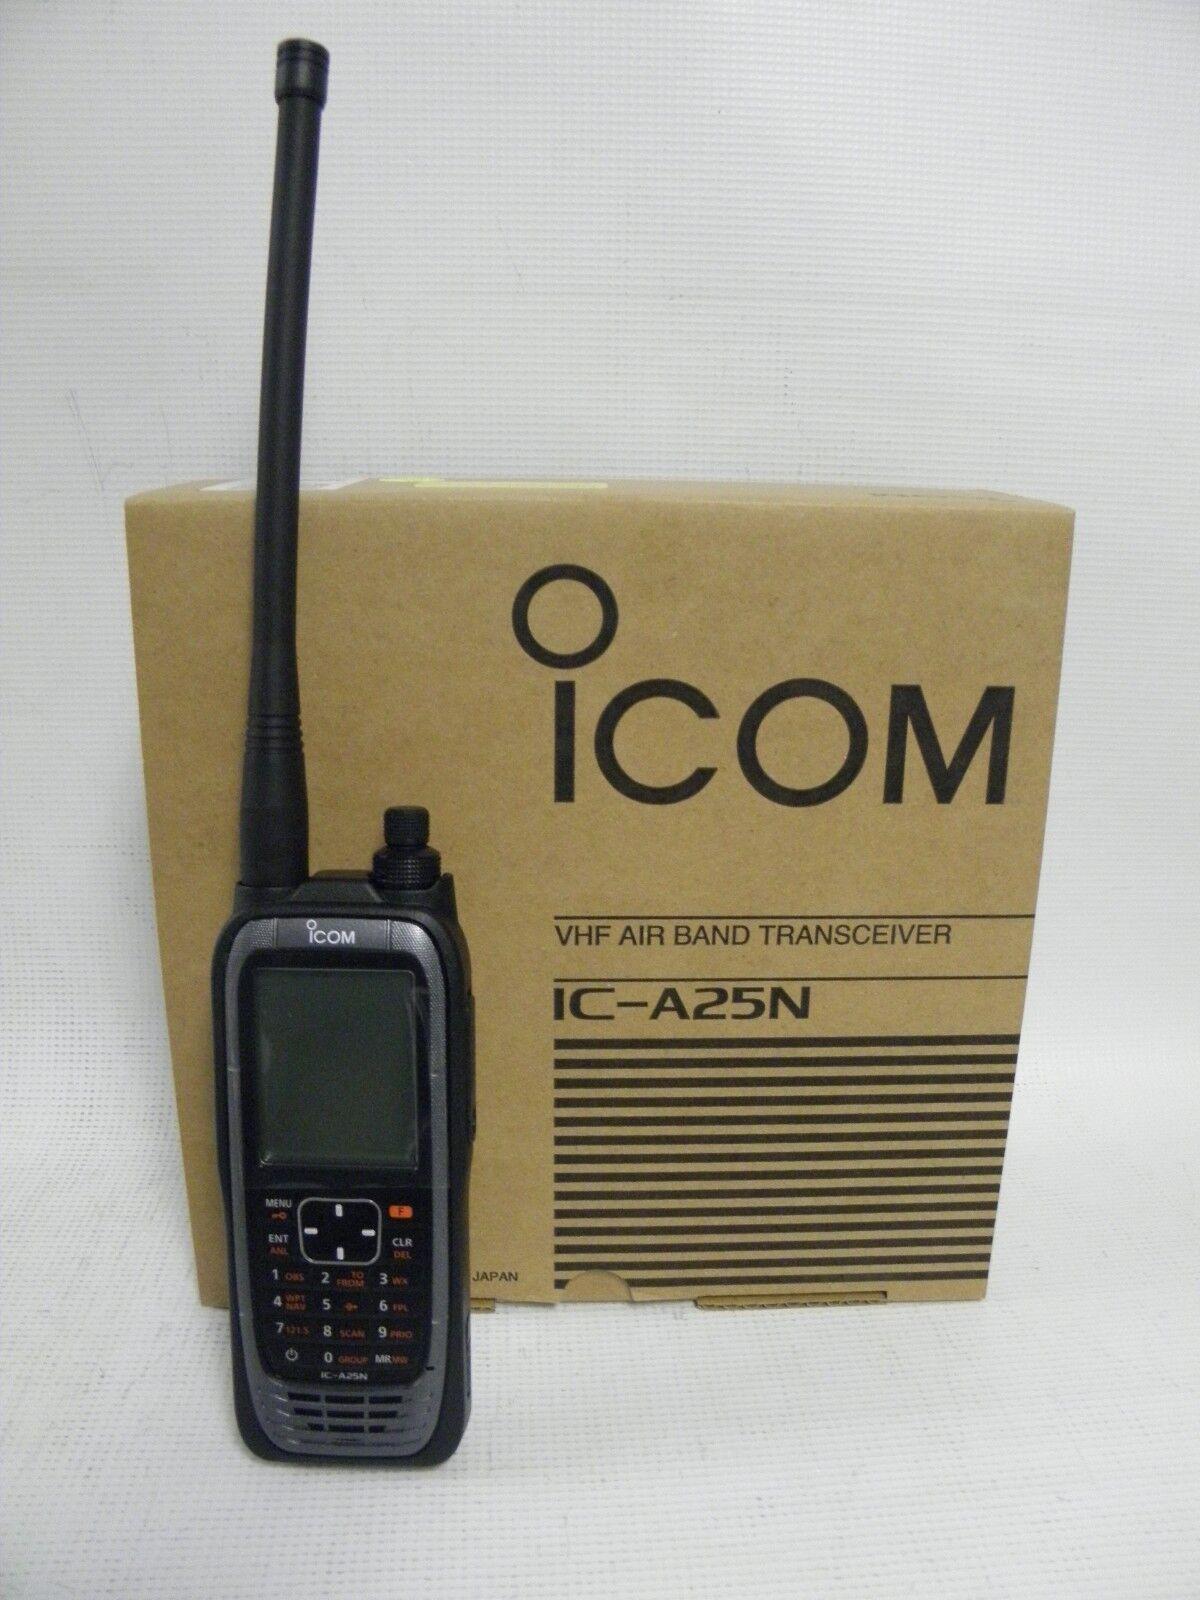 3cc7d6a6c52 Icom Ic-a25n VHF Airband Transceiver NAV   Com Channels for sale ...